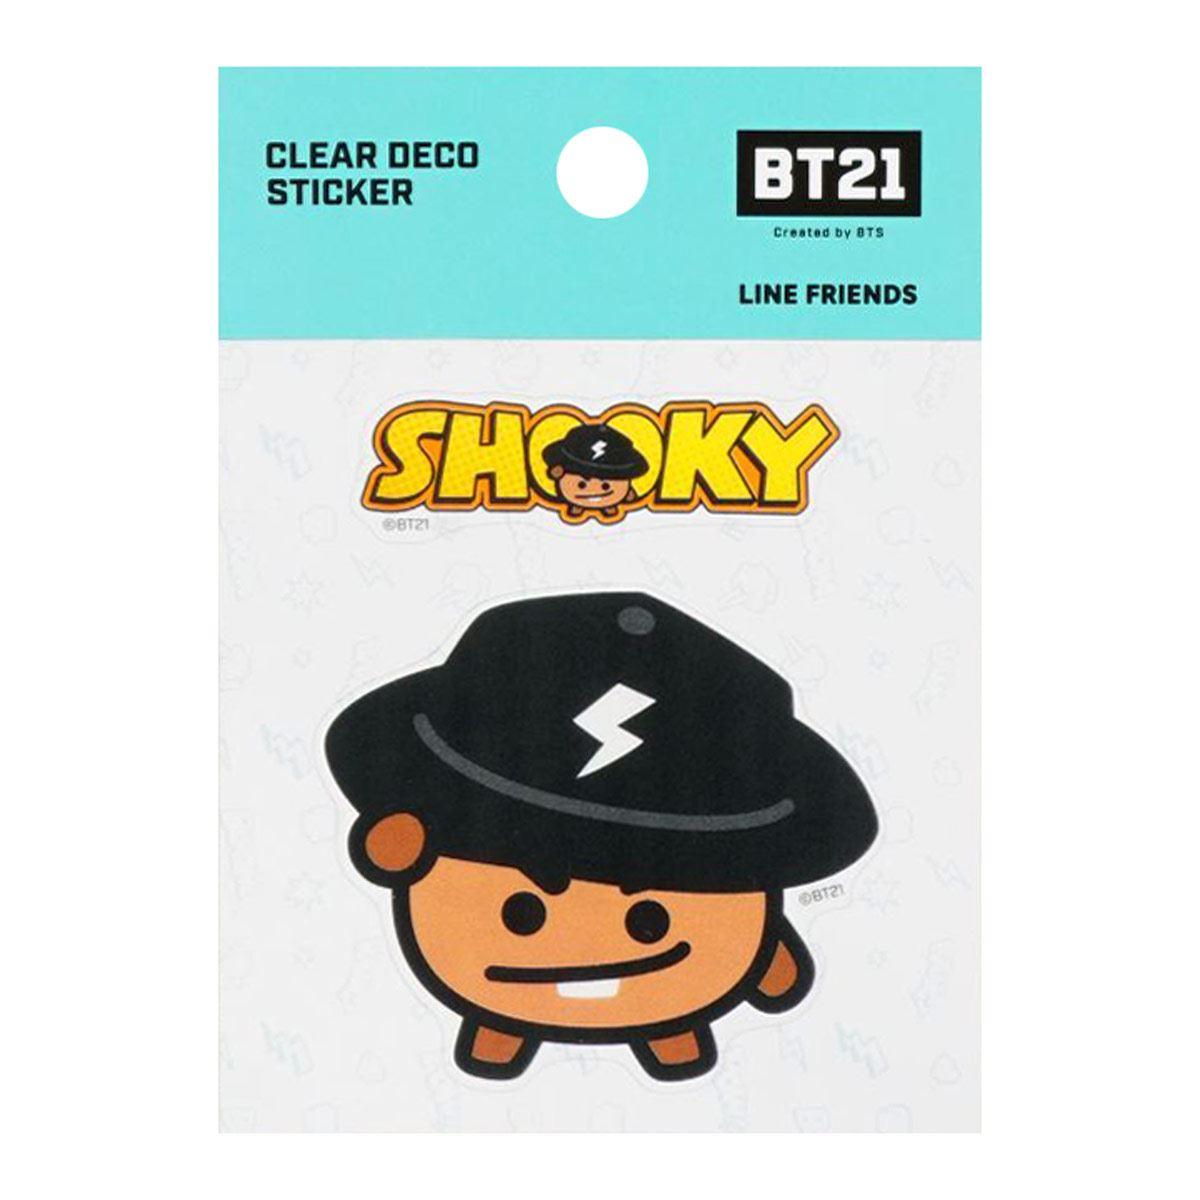 Sticker Transparente Personaje Shooky Línea BT21